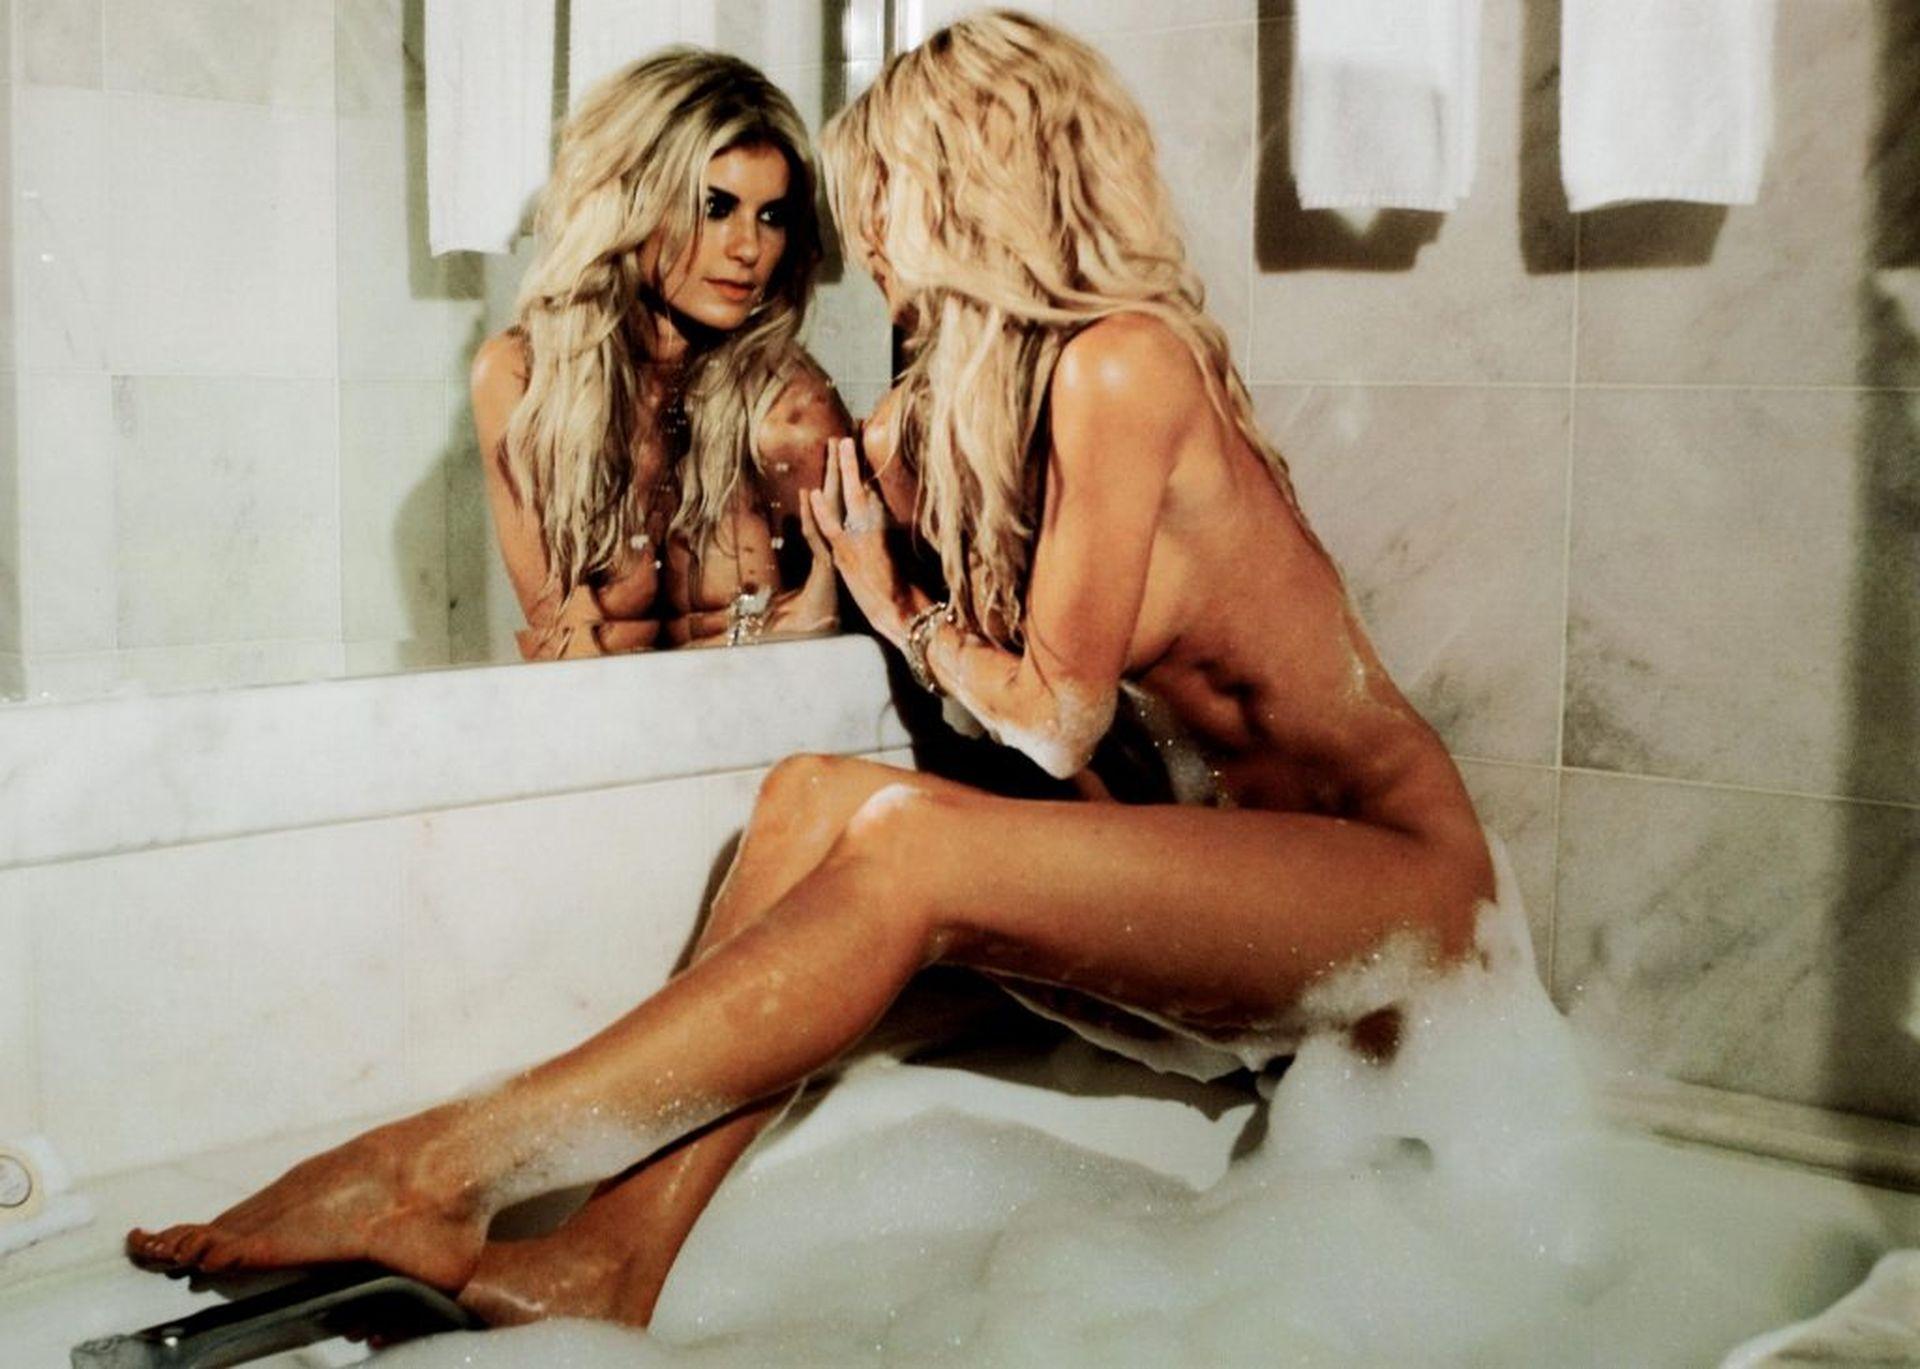 Marisa-Miller-Nude-TheFappeningBlog.com-53.jpeg